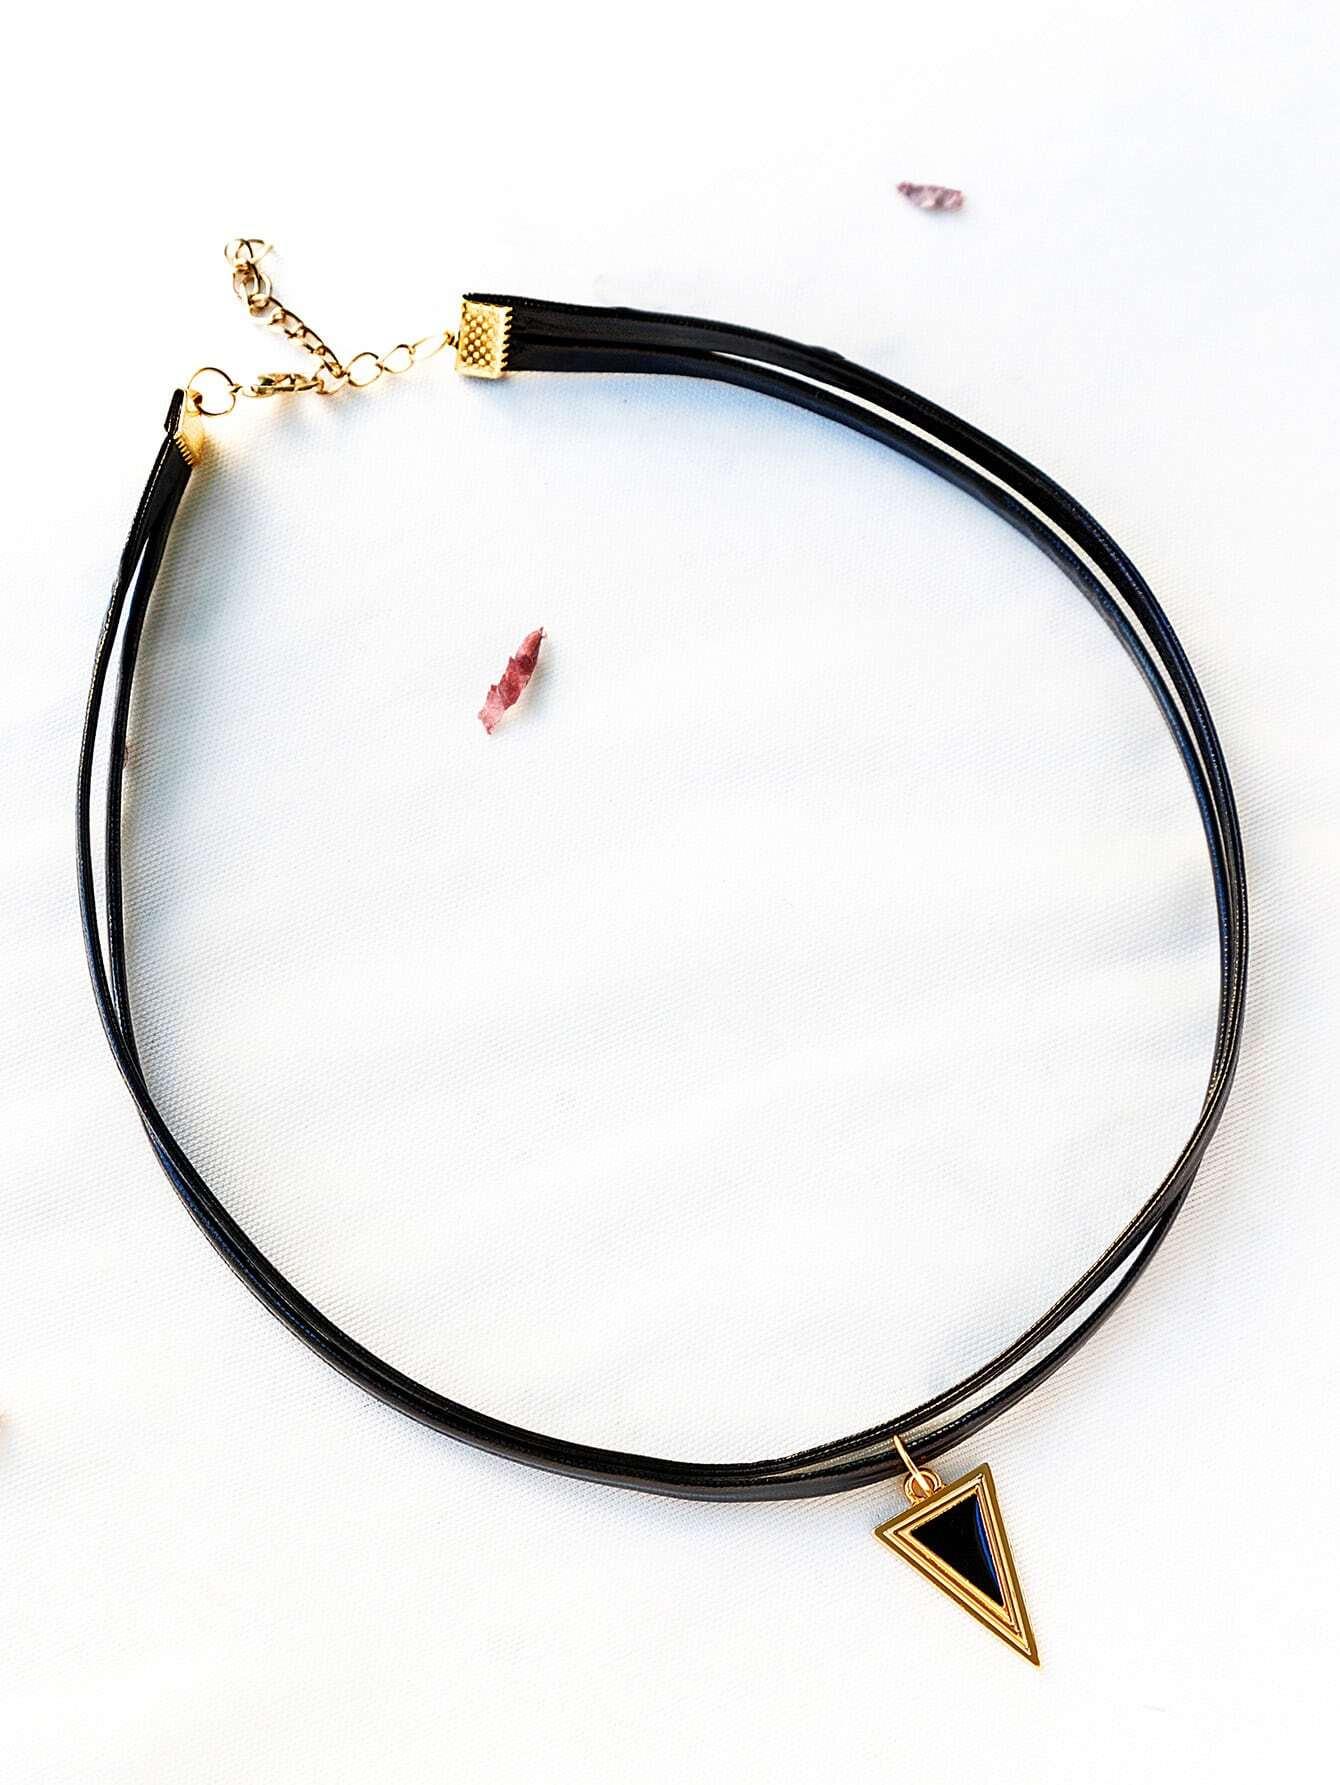 Фото Black Double Layered Triangle Pendant Choker. Купить с доставкой